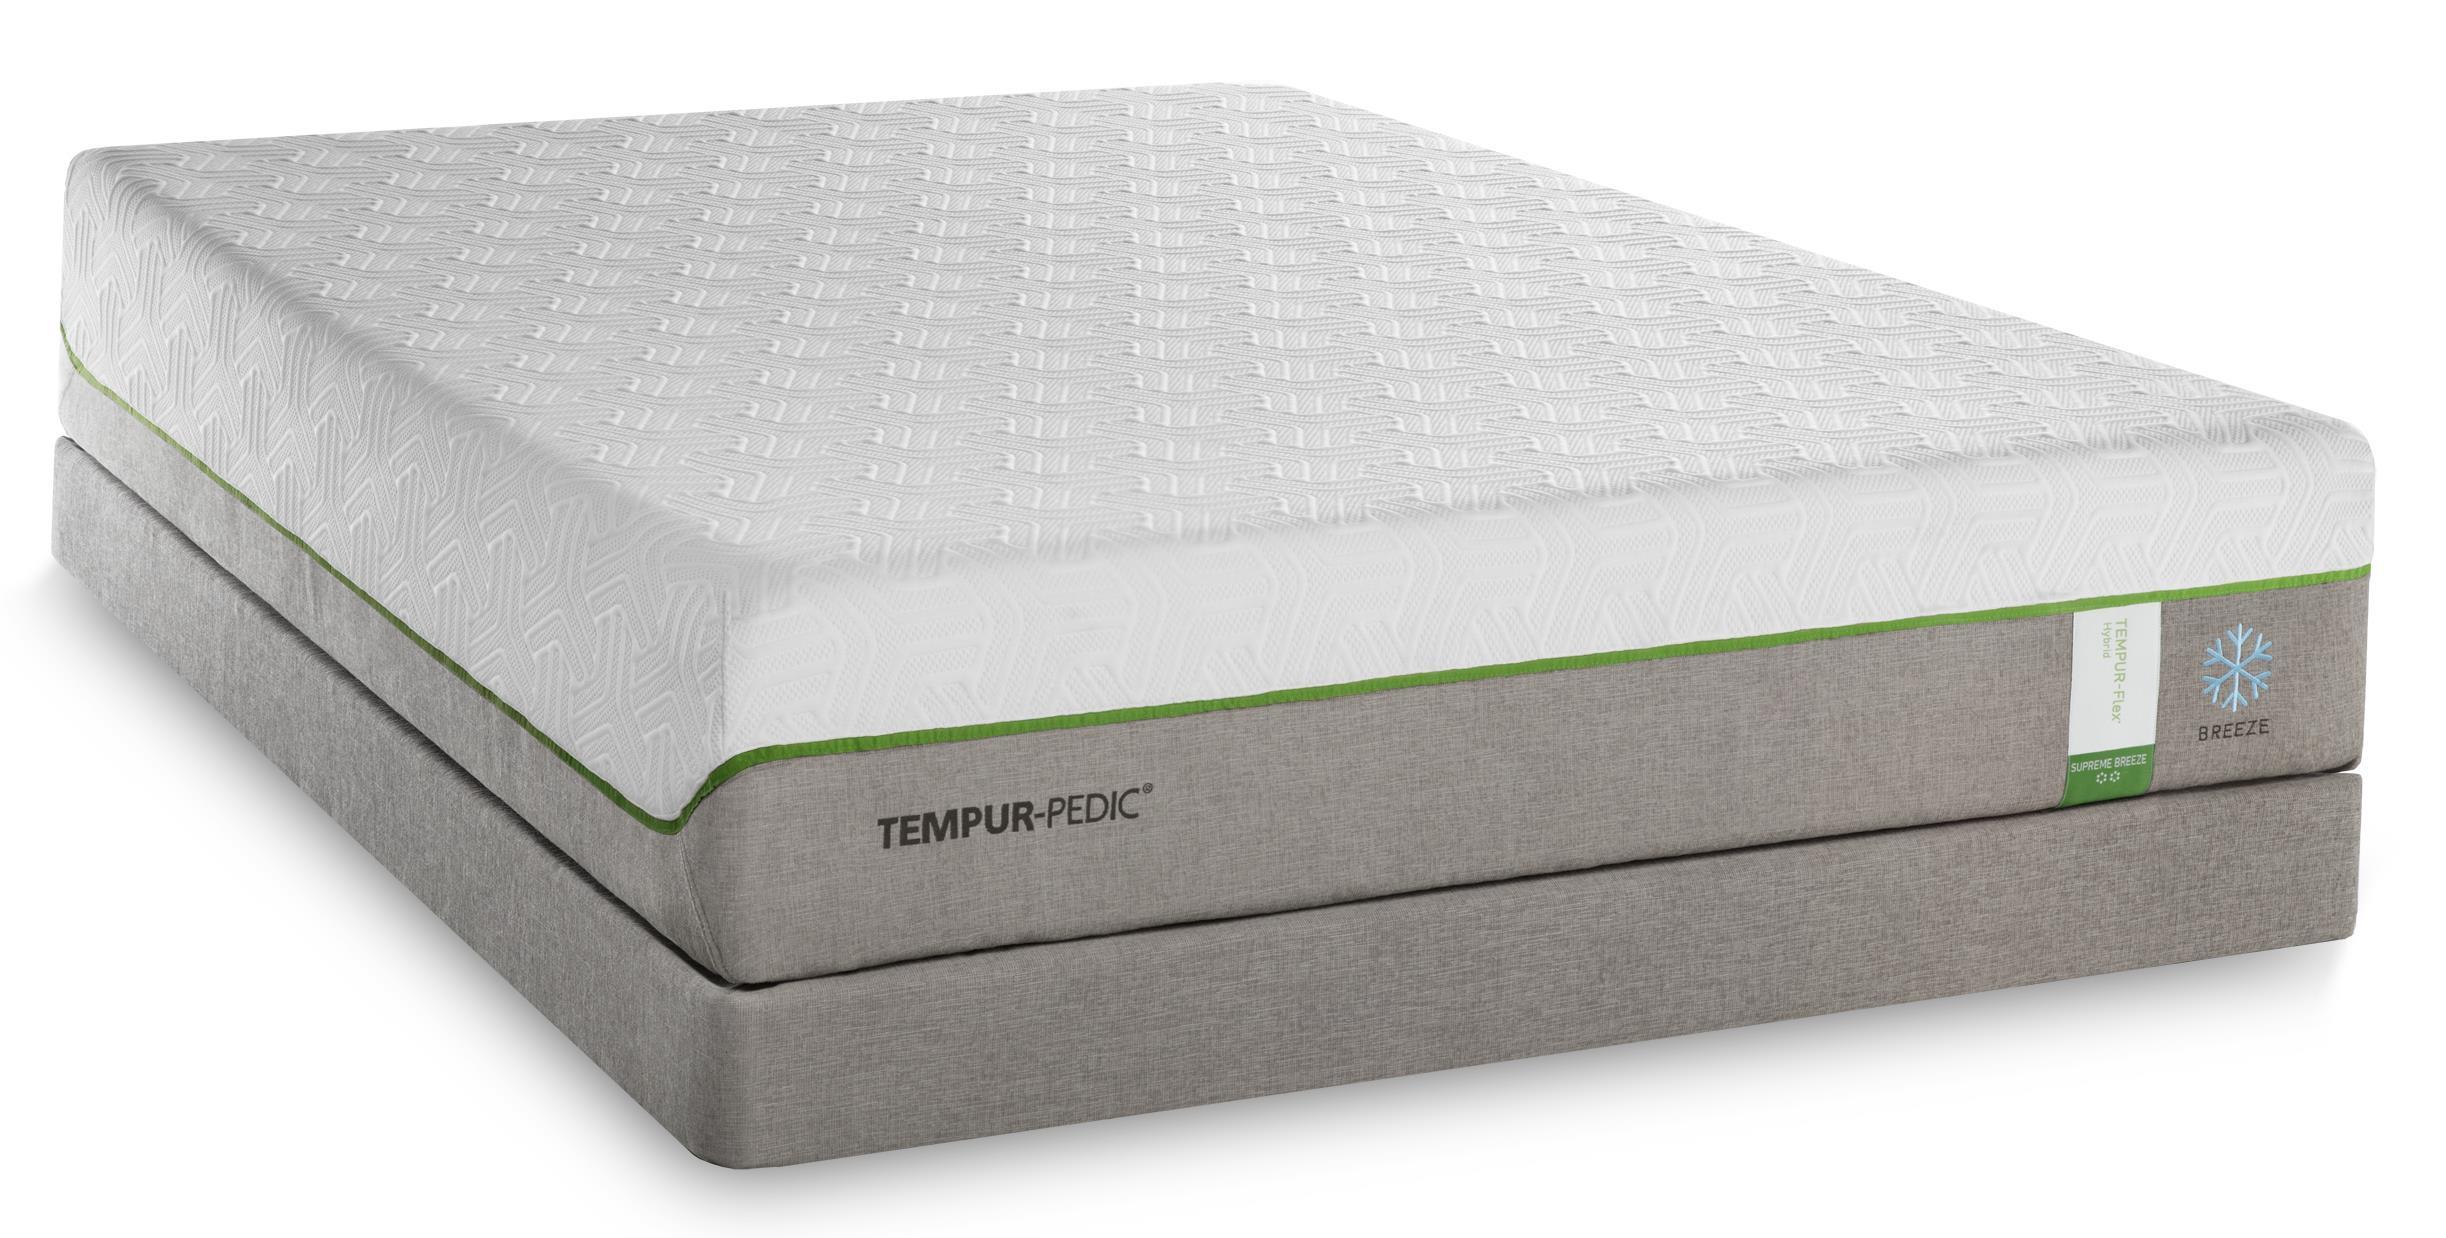 Tempur-Pedic® TEMPUR-Flex Supreme Breeze Queen Medium Plush Mattress Set, Adj - Item Number: 10292250+25287150